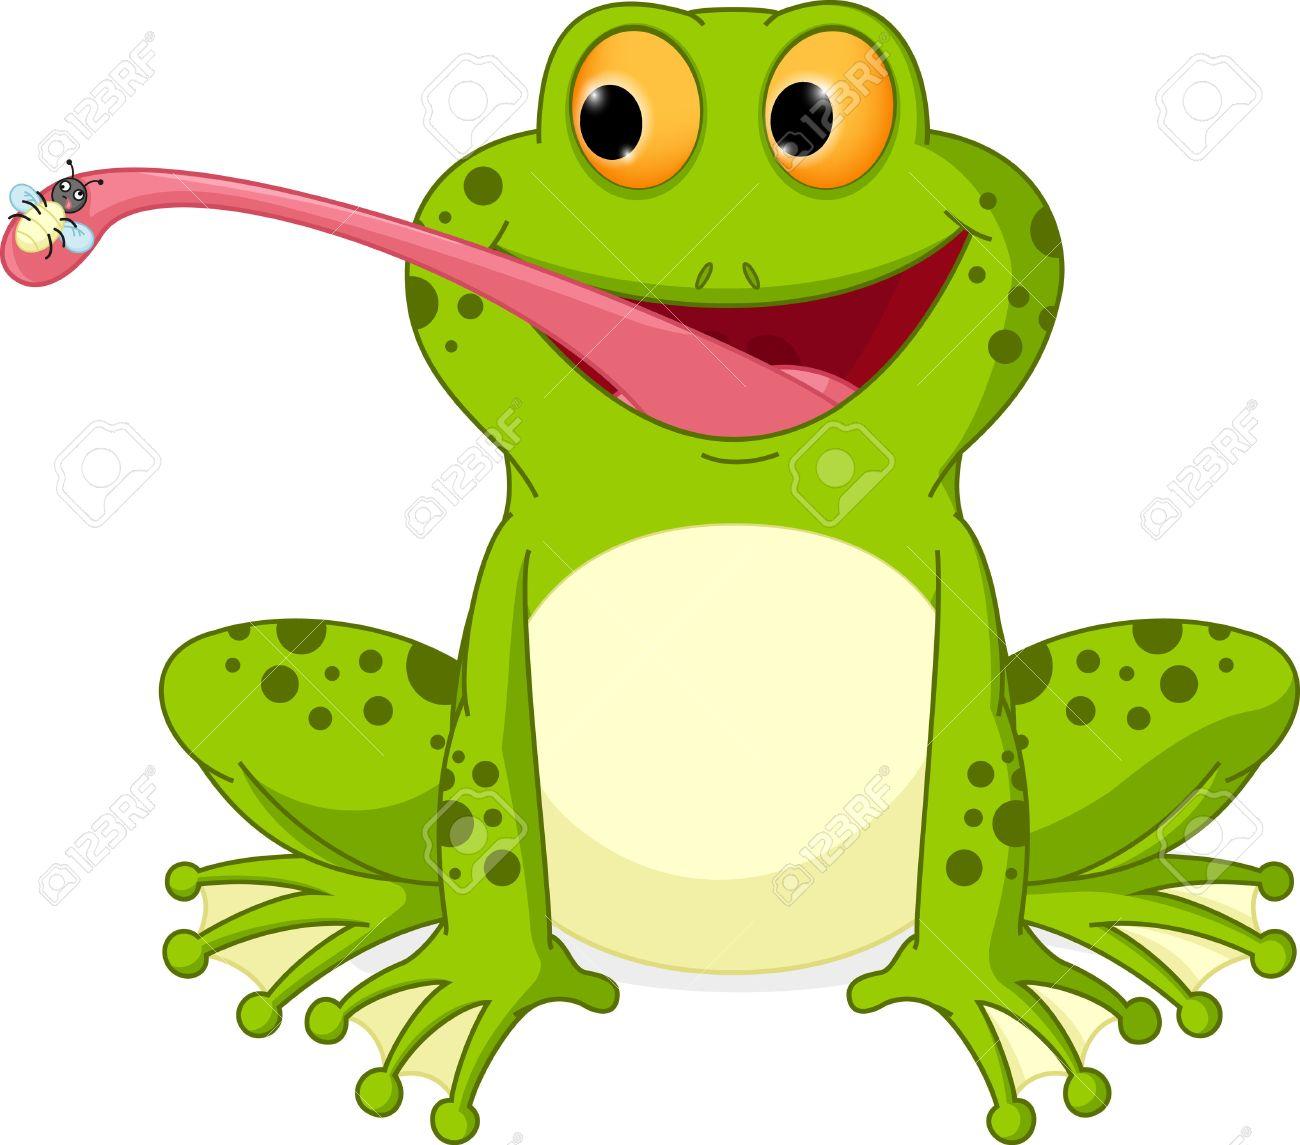 Glückliche Frosch Cartoon Fang Fly Lizenzfrei Nutzbare